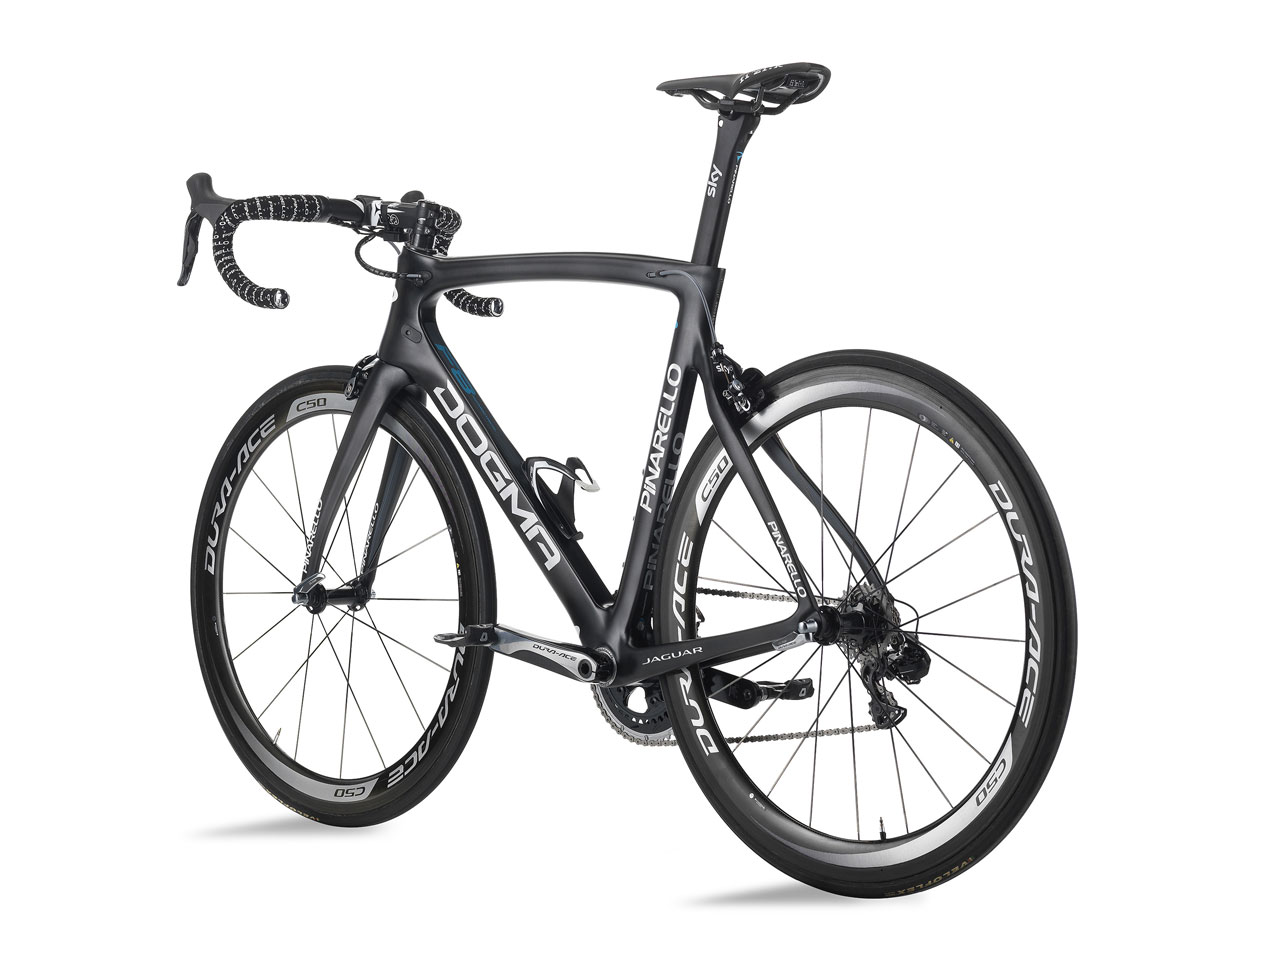 Jaguar, Team Sky and Pinarello - Tour de France racing bike